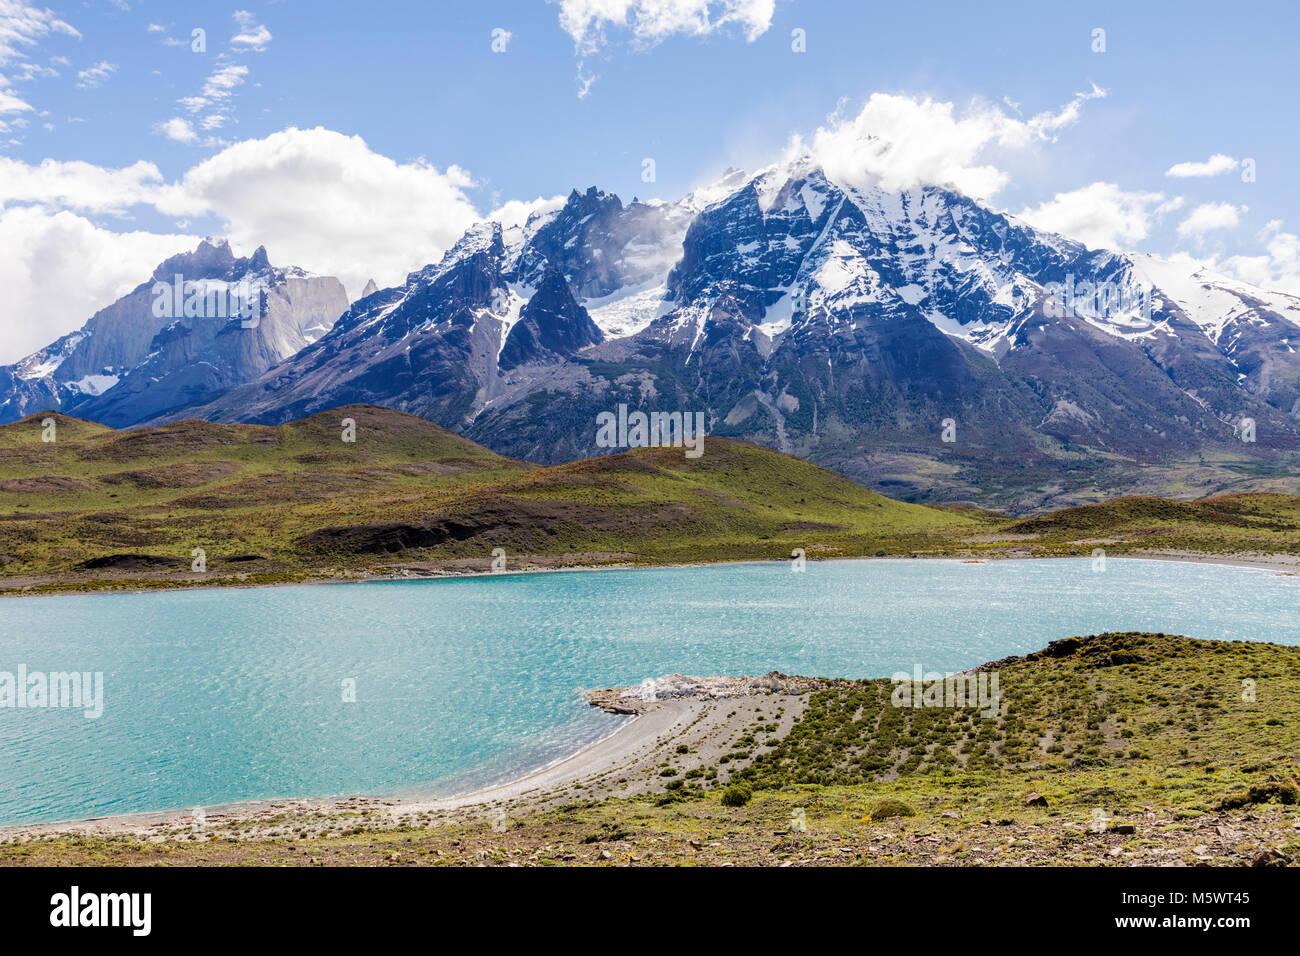 Lago Nordenskjold; Mte. Almirante Nieto; 2640 meters; Torres del Paine National Park; Chile - Stock Image